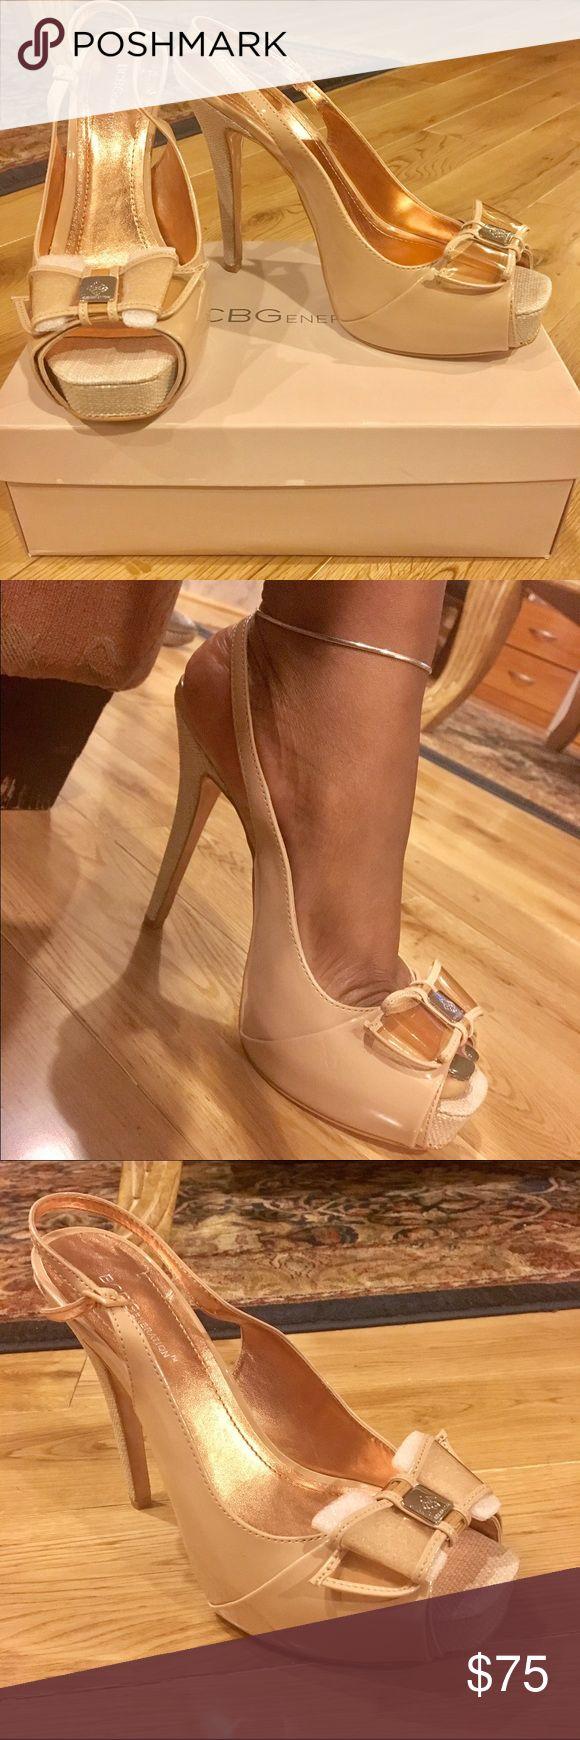 BCBGeneration BG-Angelo Nude Heels NEVER WORN! Designer: BCBGeneration| Style: BG-Angelo heels | Color: Mojave (nude) | Size: 11 BCBGeneration Shoes Heels